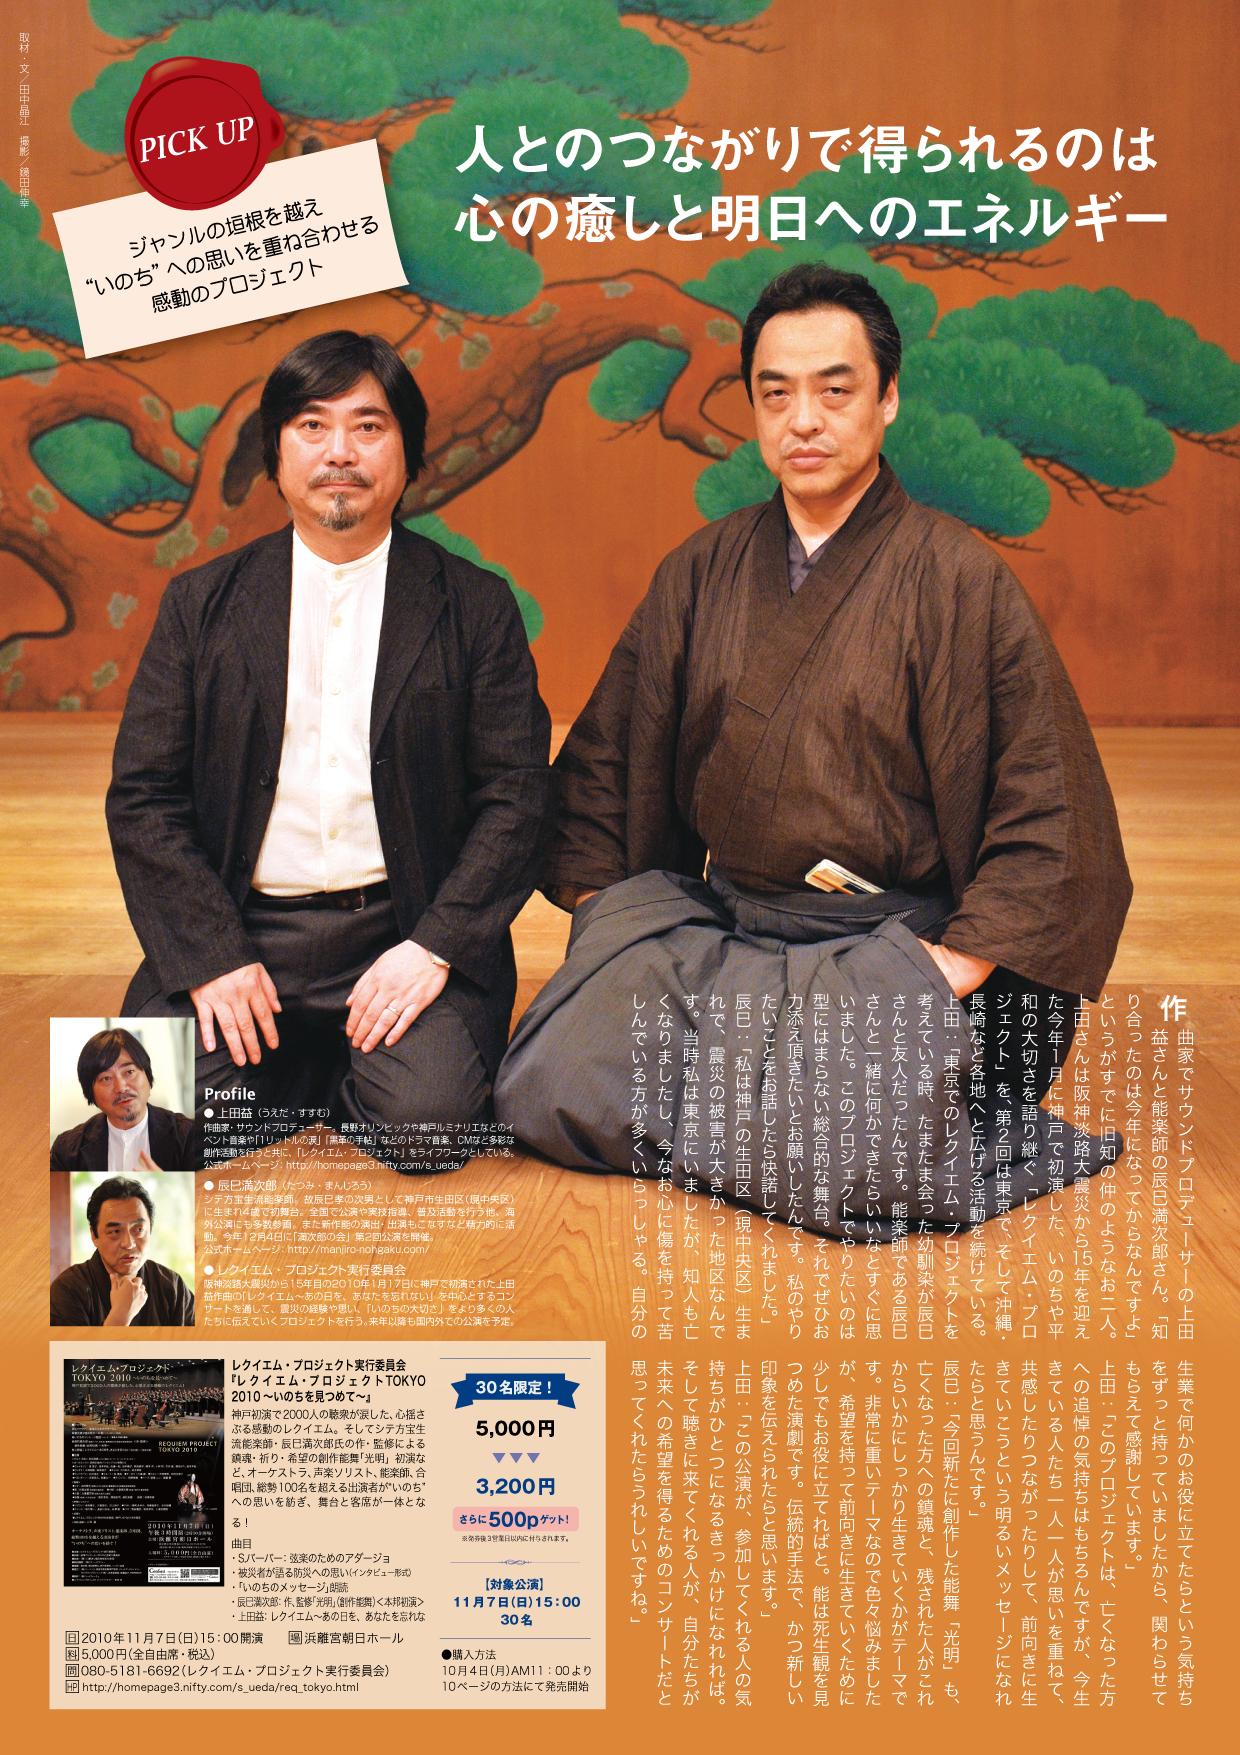 http://manjiro-nohgaku.com/news/plus2010.11%20req%20tokyo.png